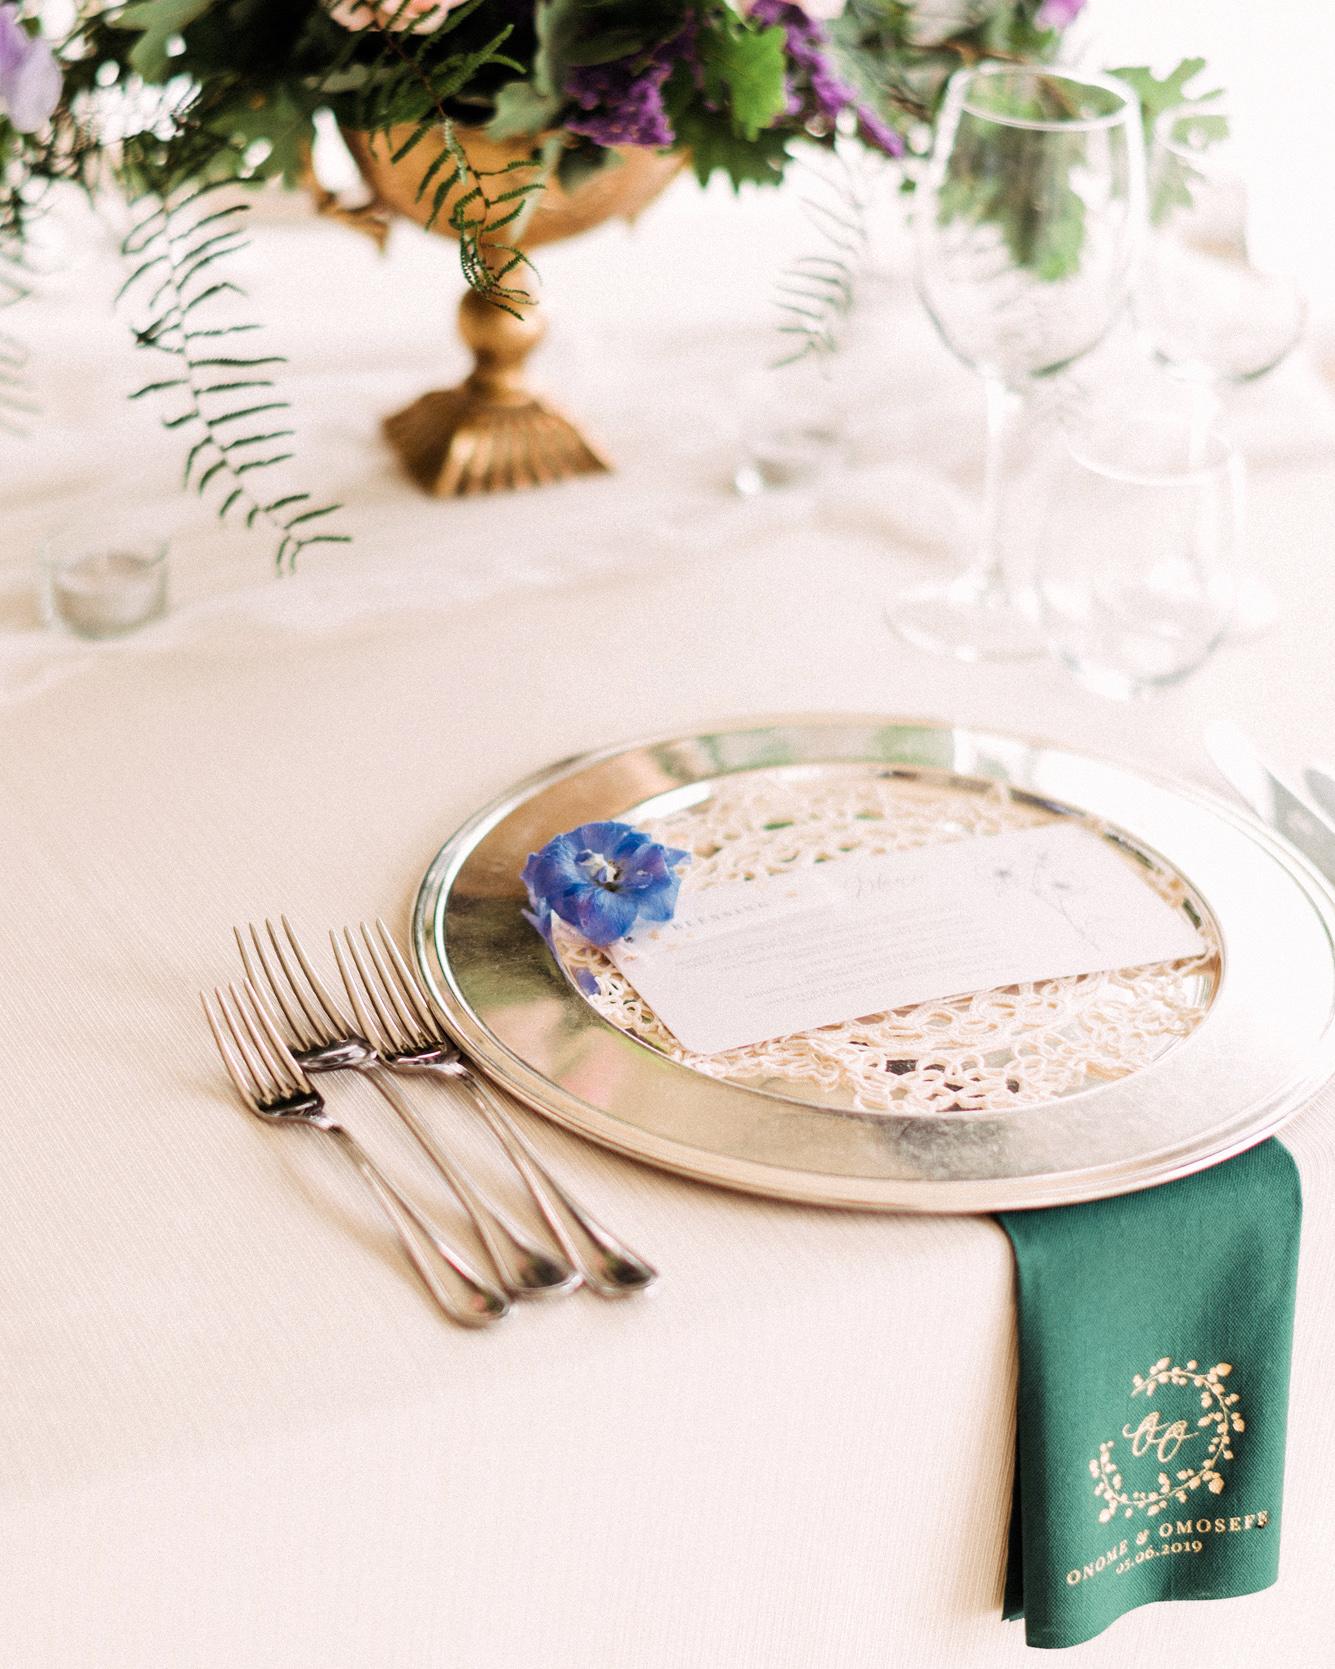 onome efe wedding reception place setting